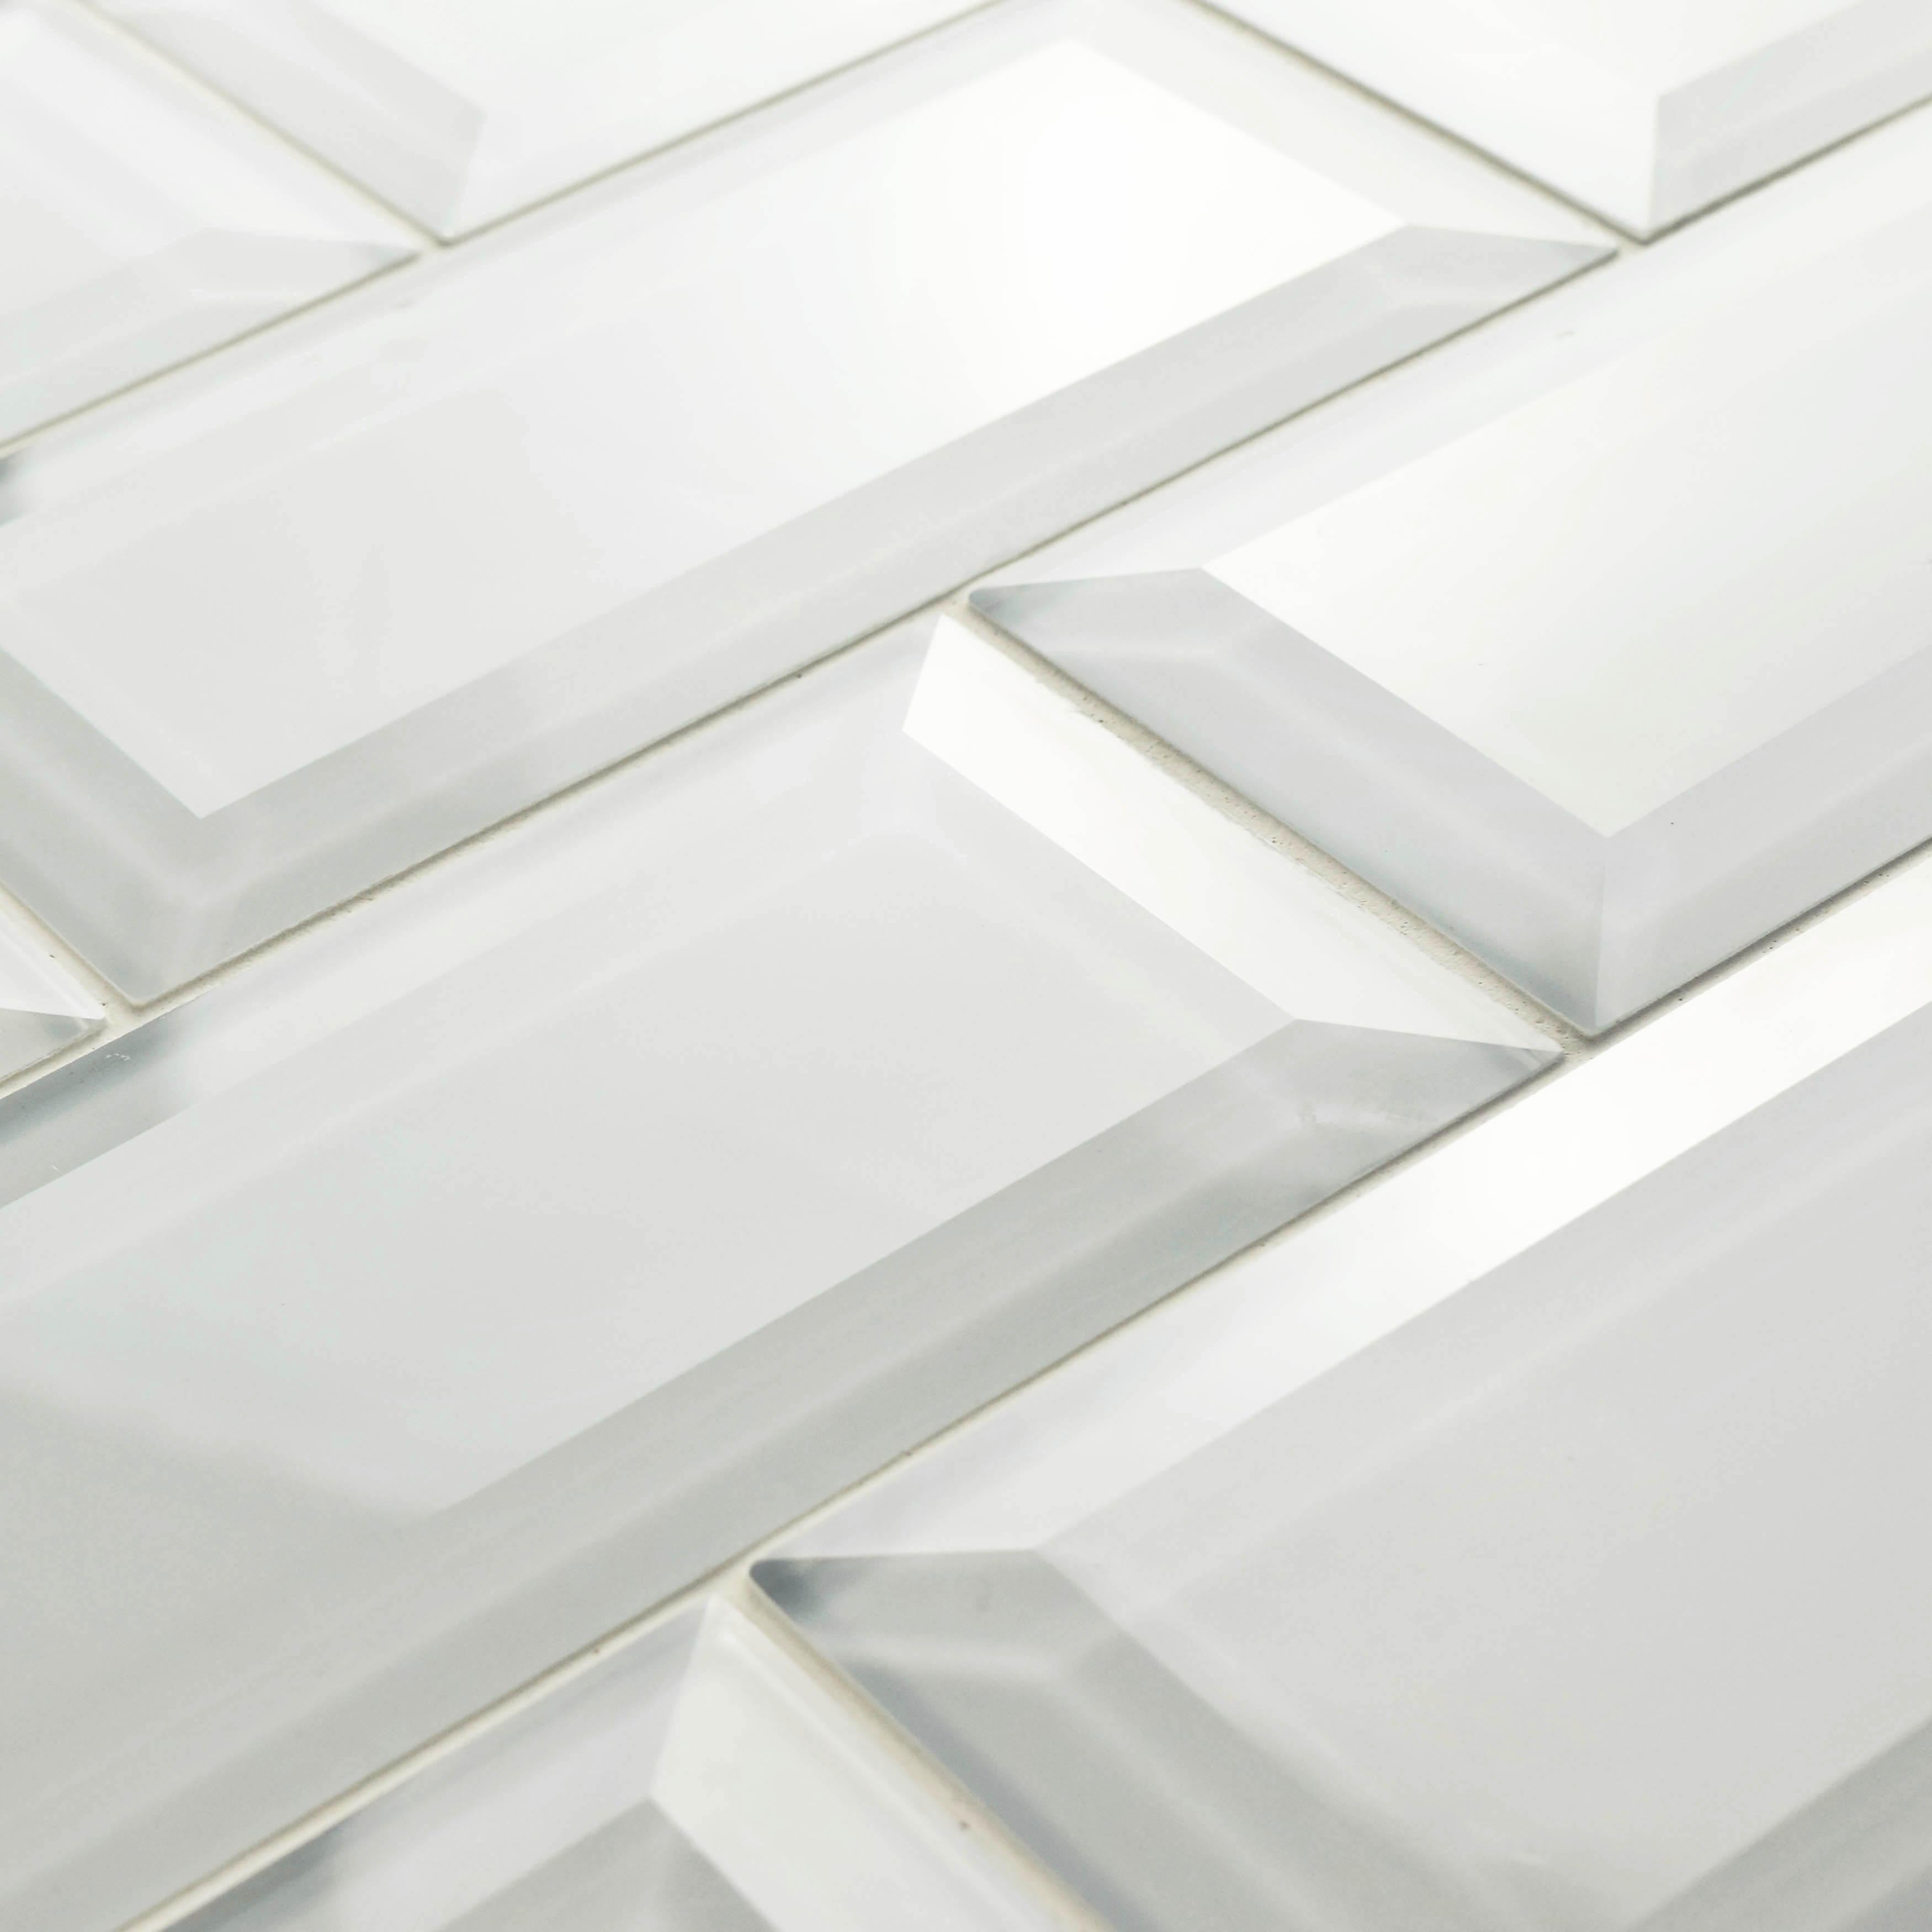 Inch Reflections Beveled Ice White